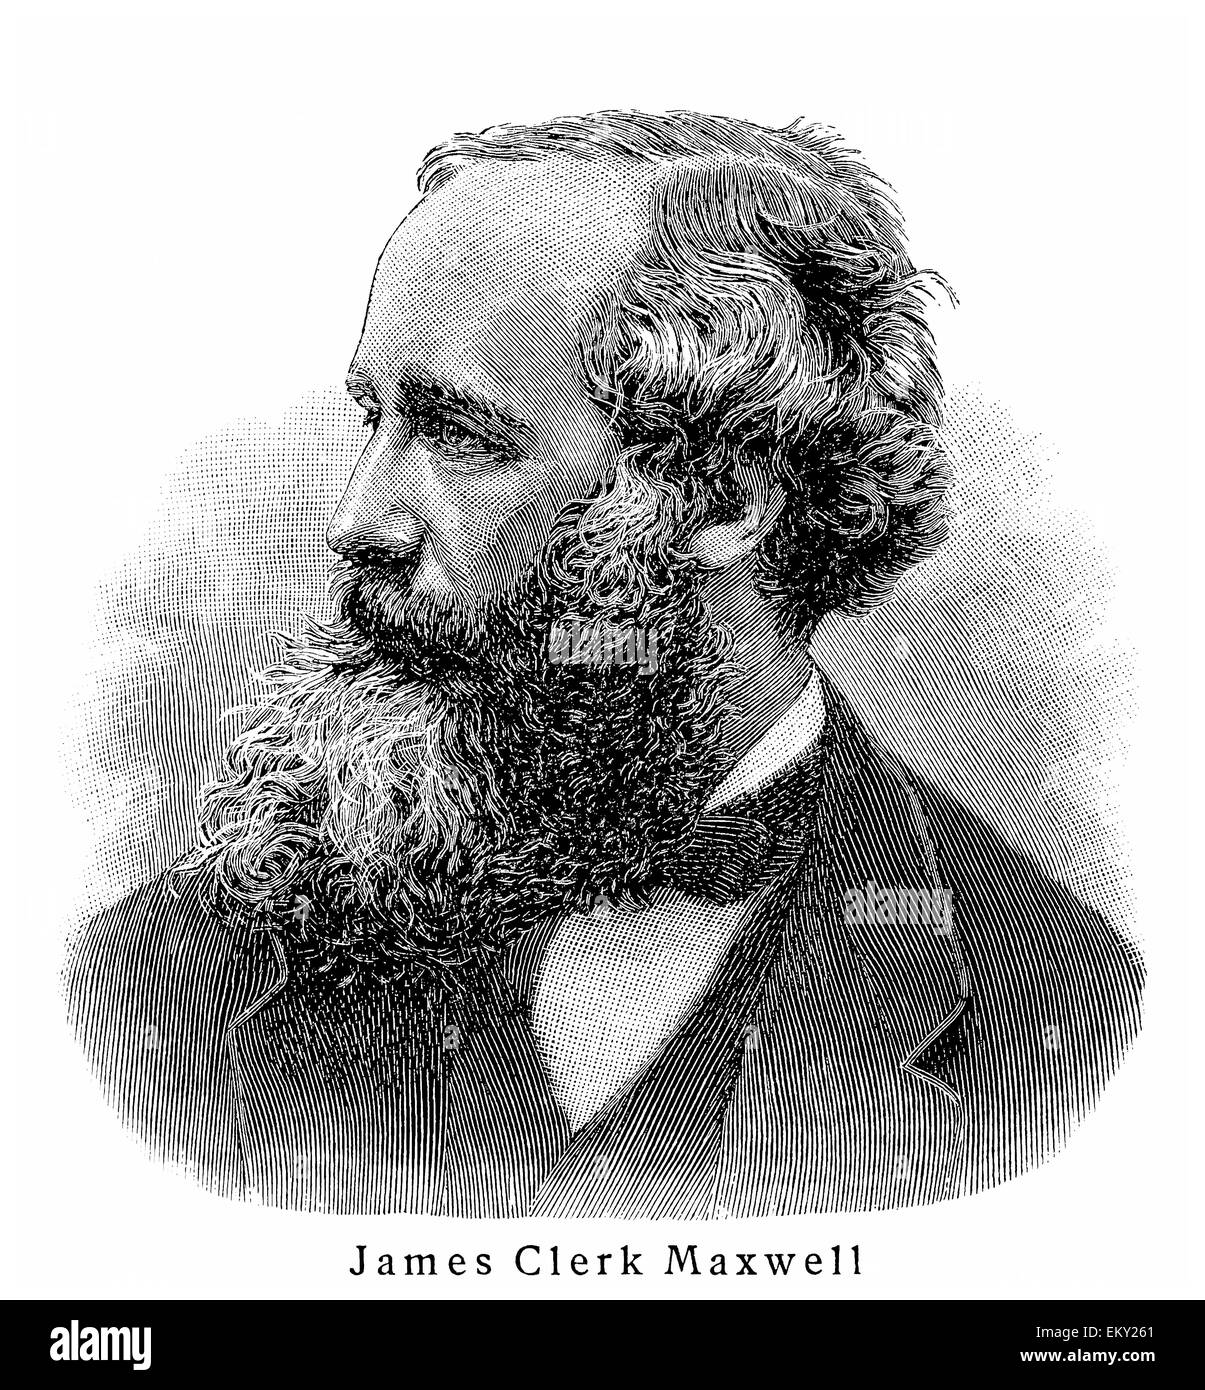 James Clerk Maxwell Photo Stock